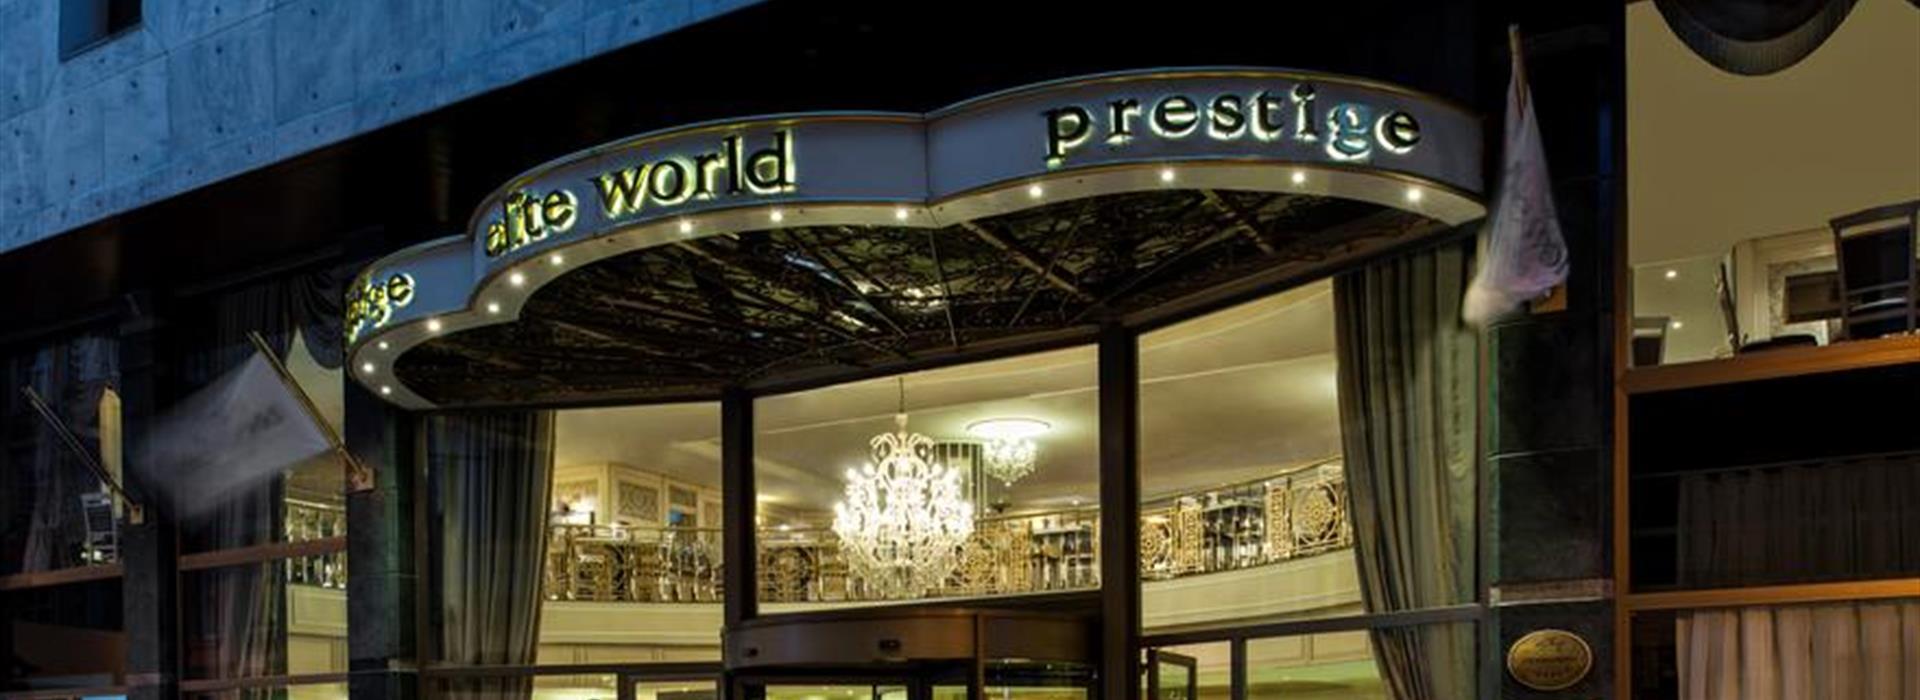 Elite-World-Prestige-Hotel